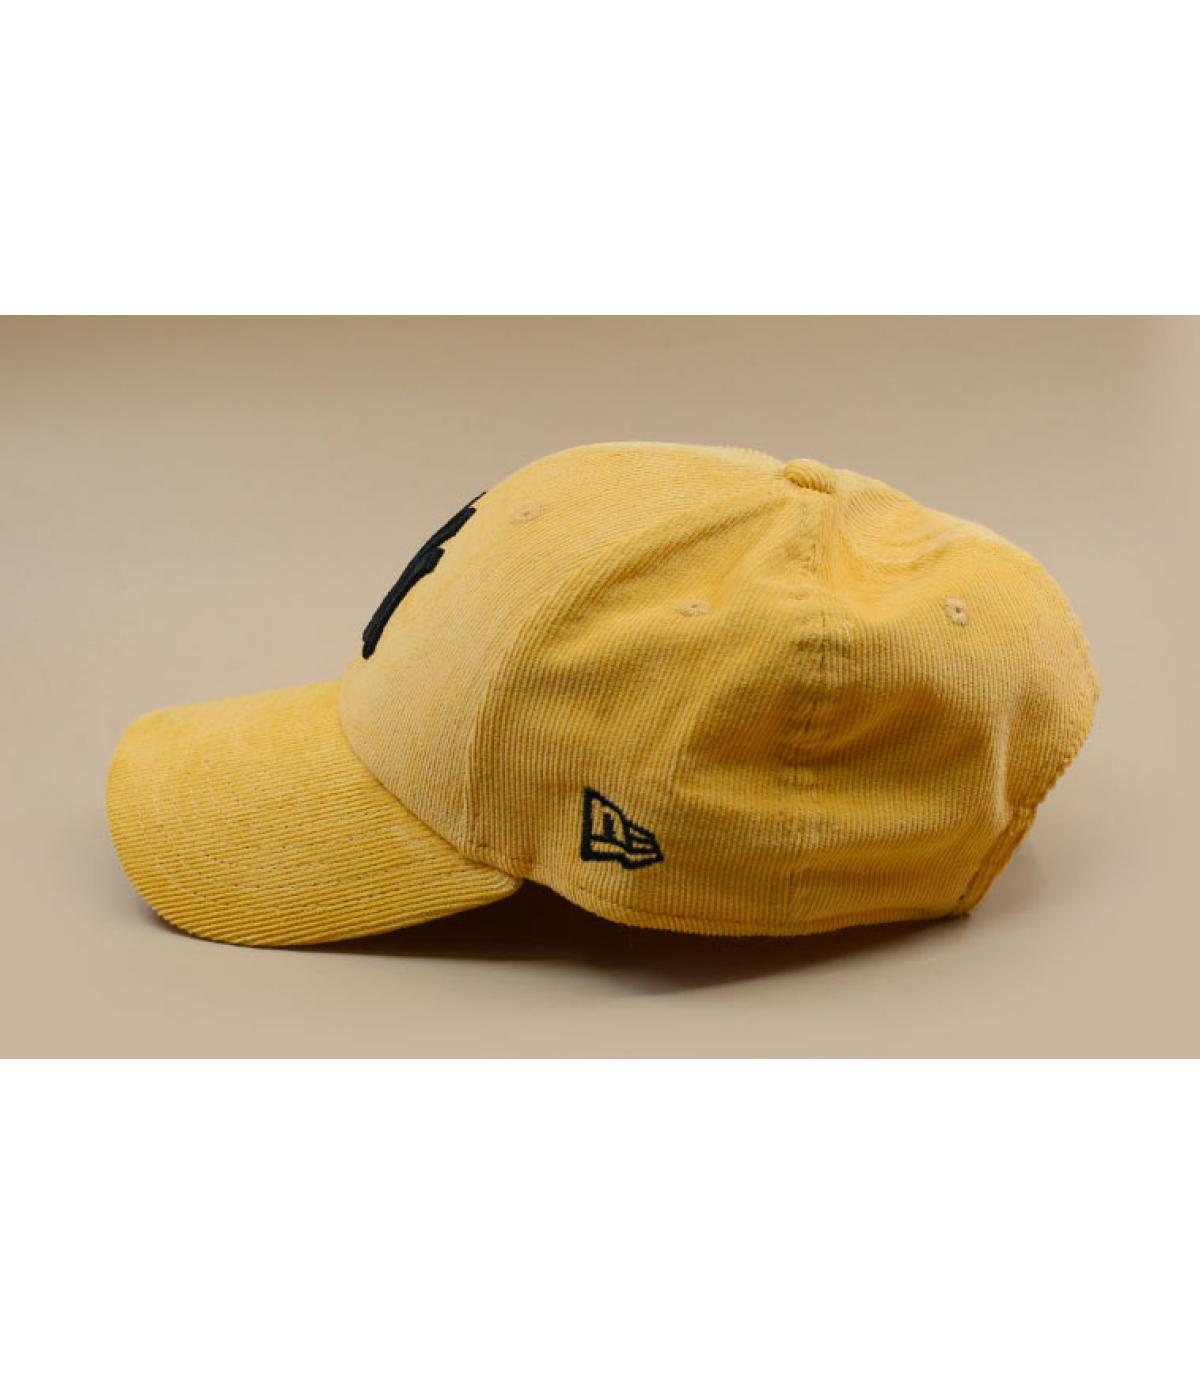 Detalles Cord Pack 940 NY mellow yellow black imagen 4